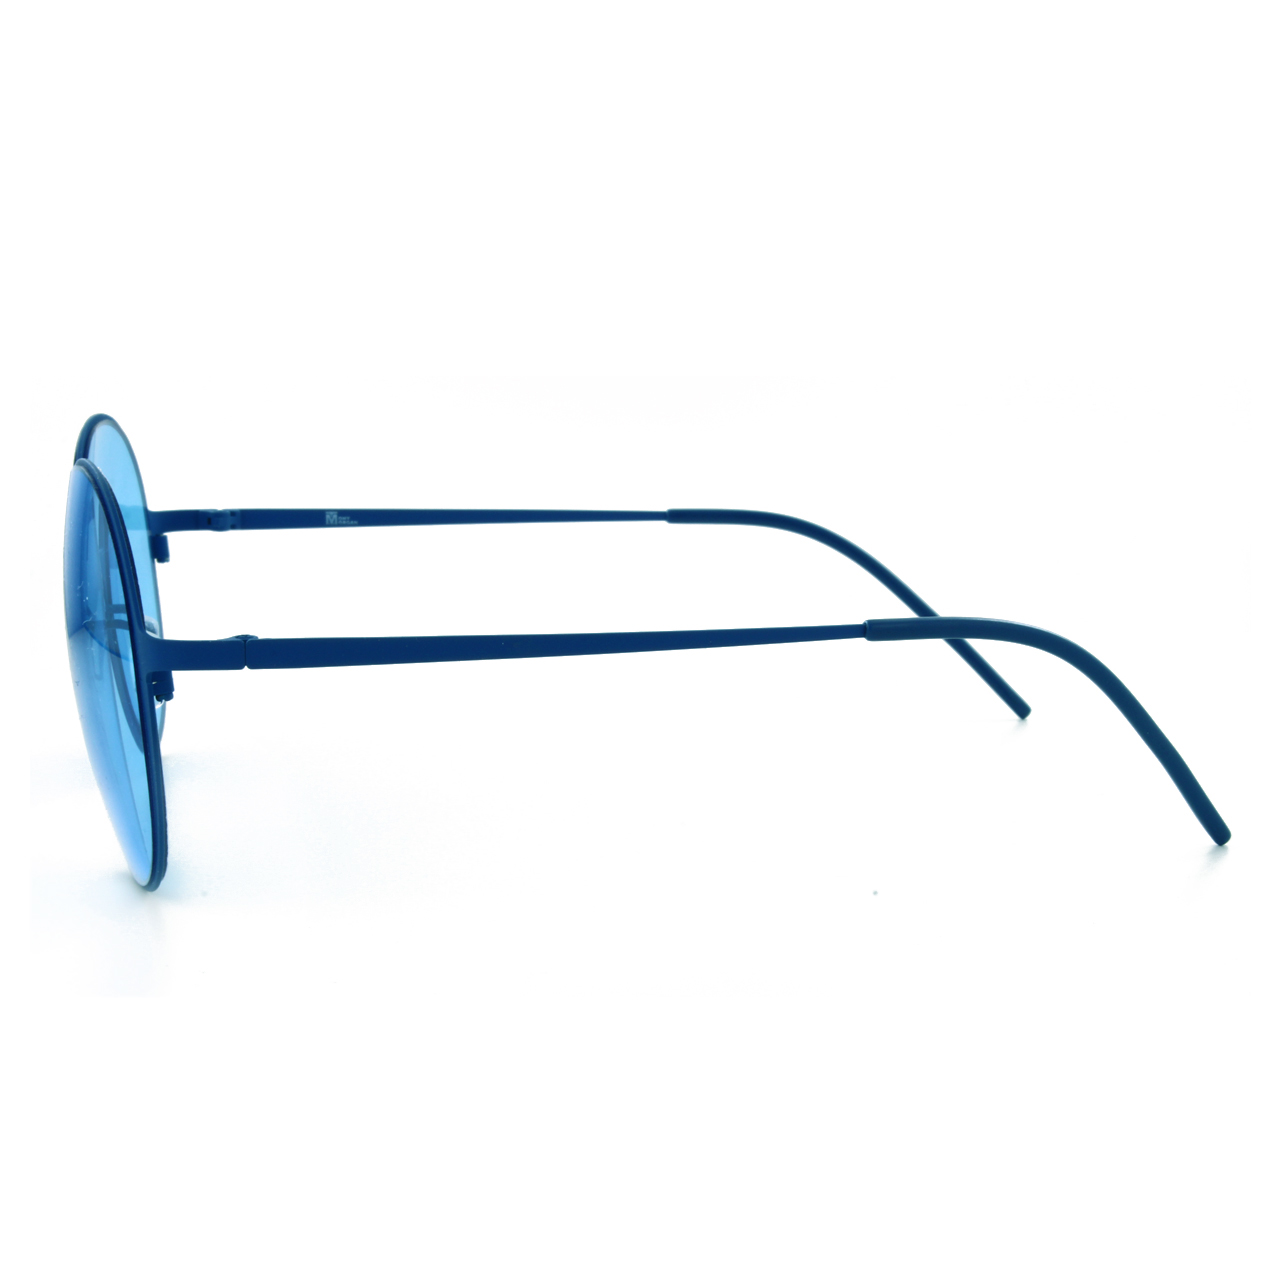 e5d654b938f ... GEEK COUTURE Mod Chic Sunglasses Blue ...